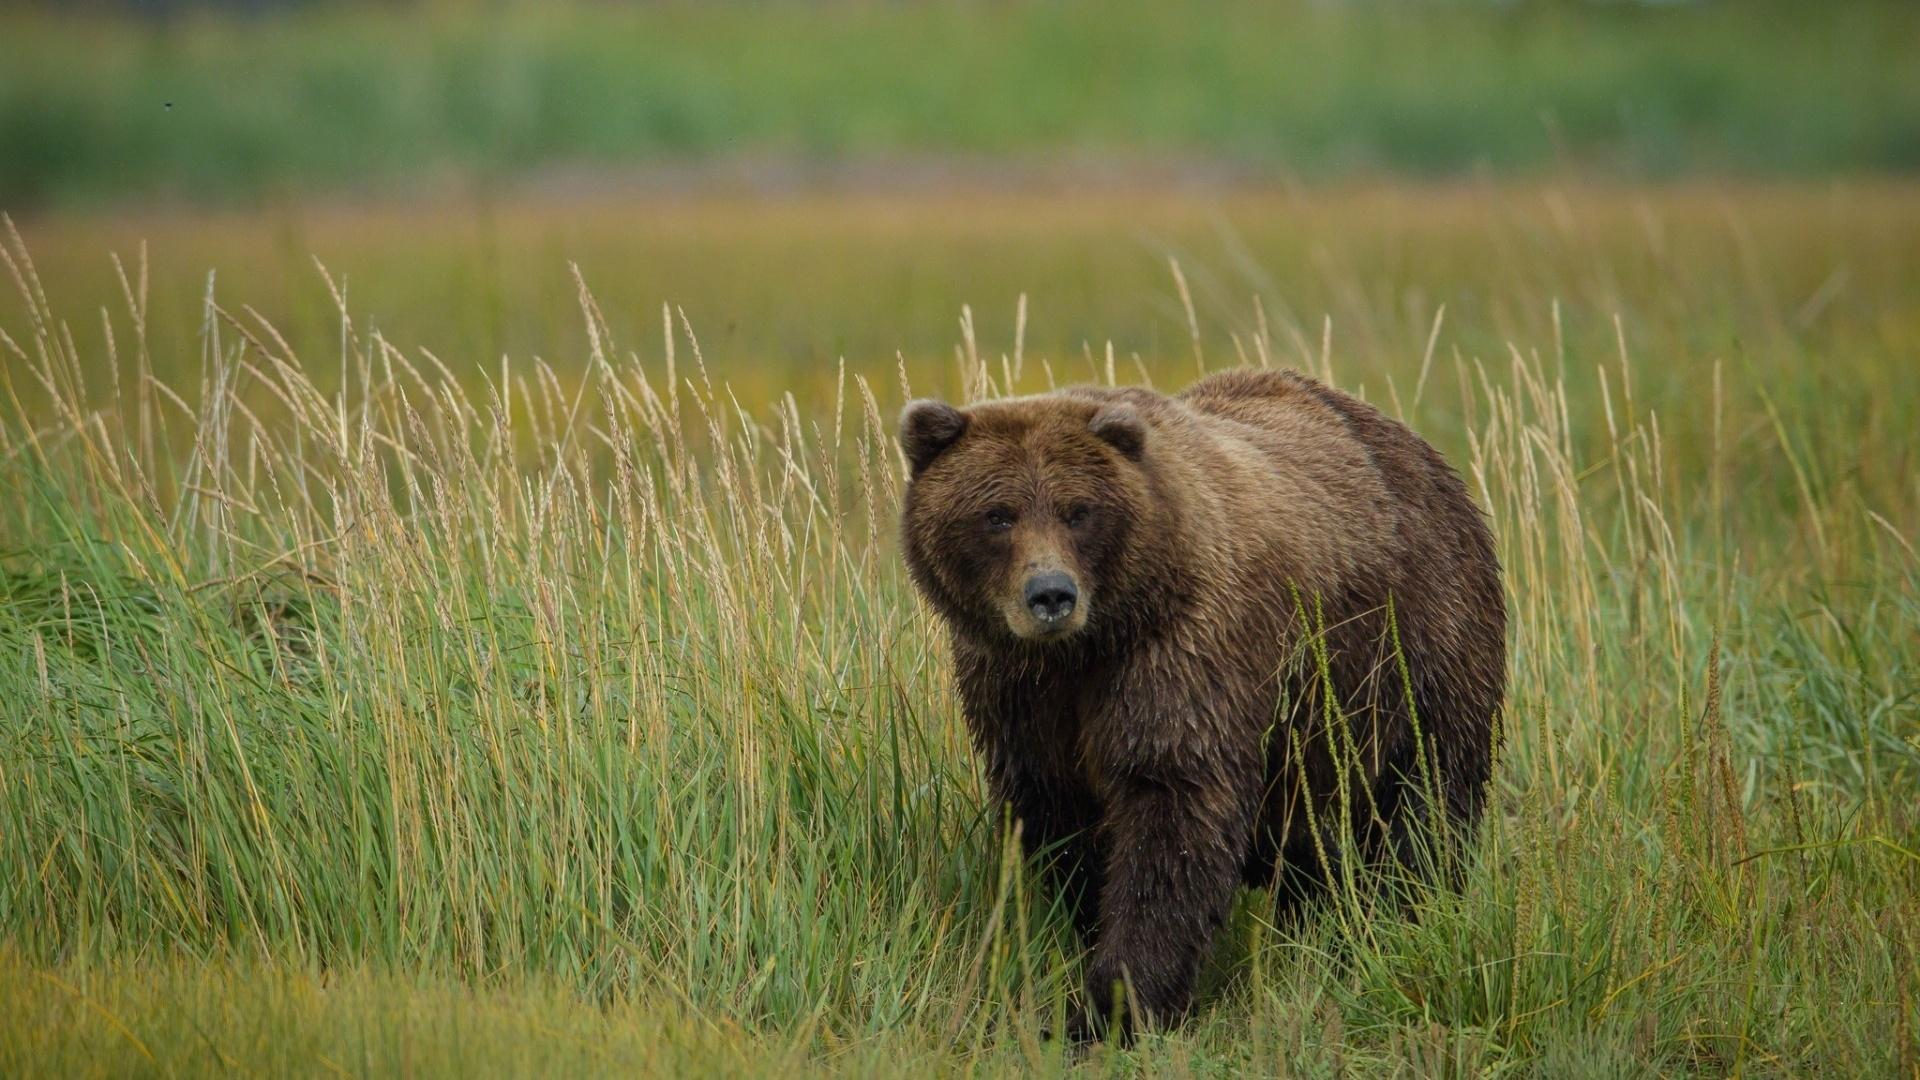 grizzly b r im gras 1920x1200 hd hintergrundbilder hd bild. Black Bedroom Furniture Sets. Home Design Ideas